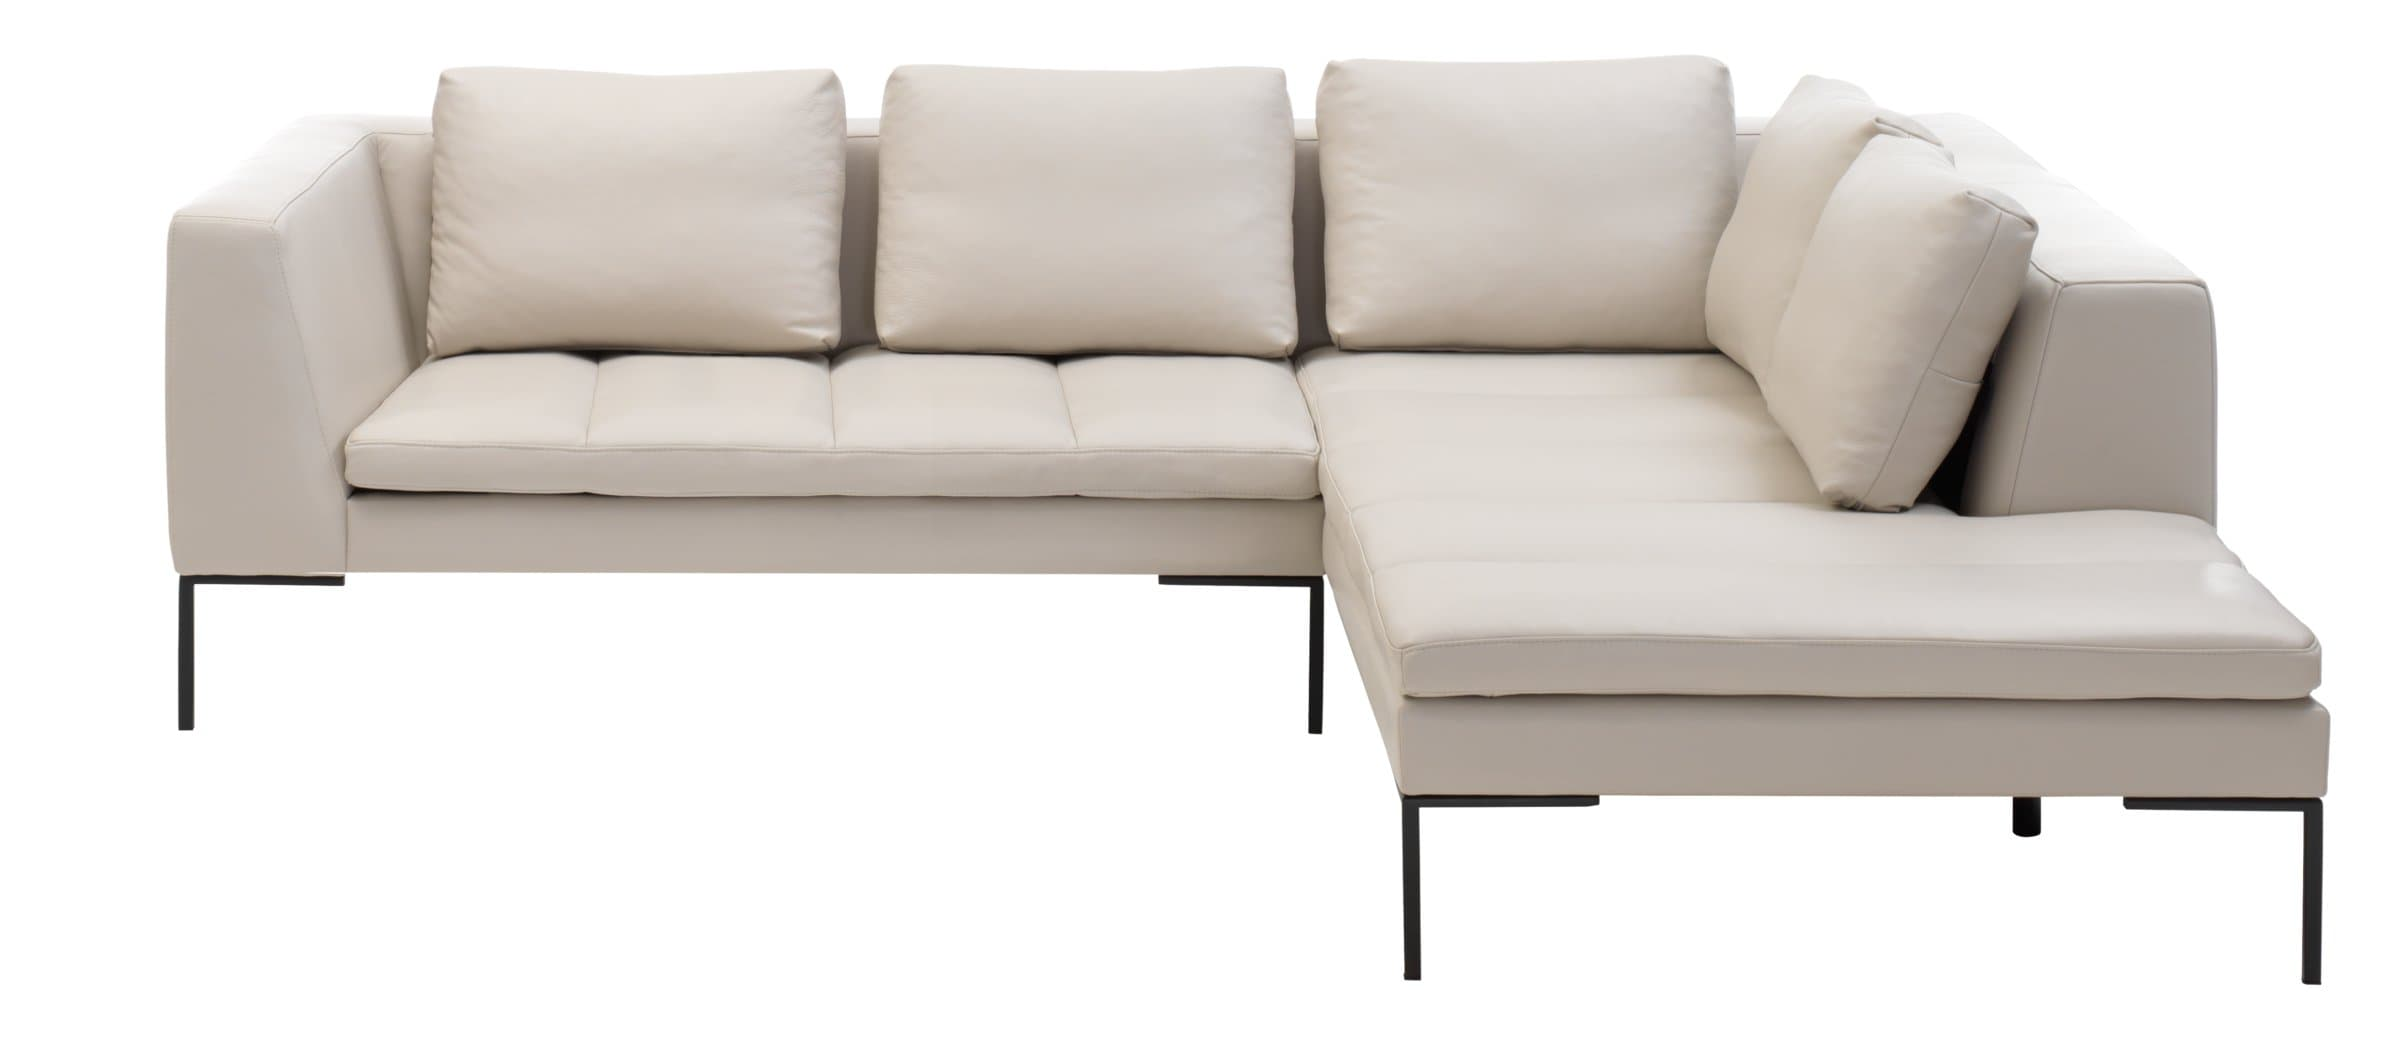 BADER Canapé d'angle